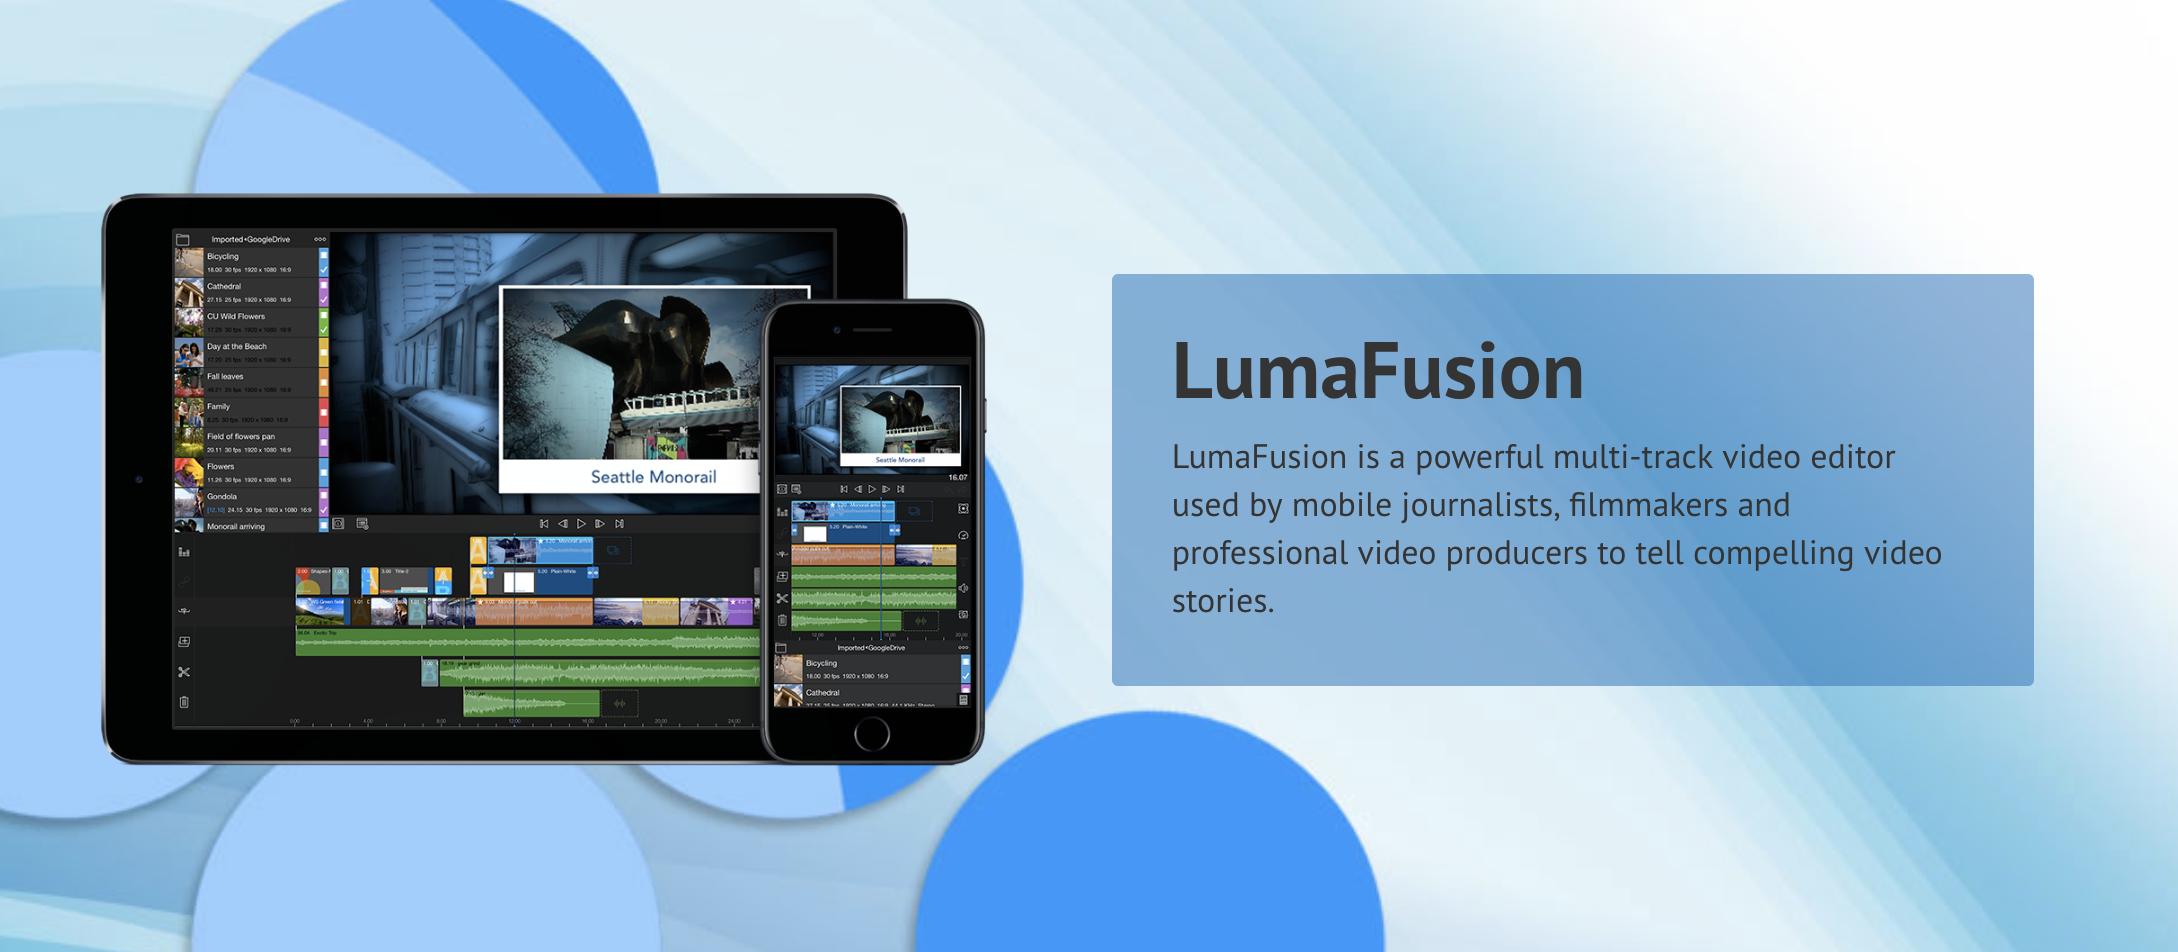 LumaFusion app for mobile video editing